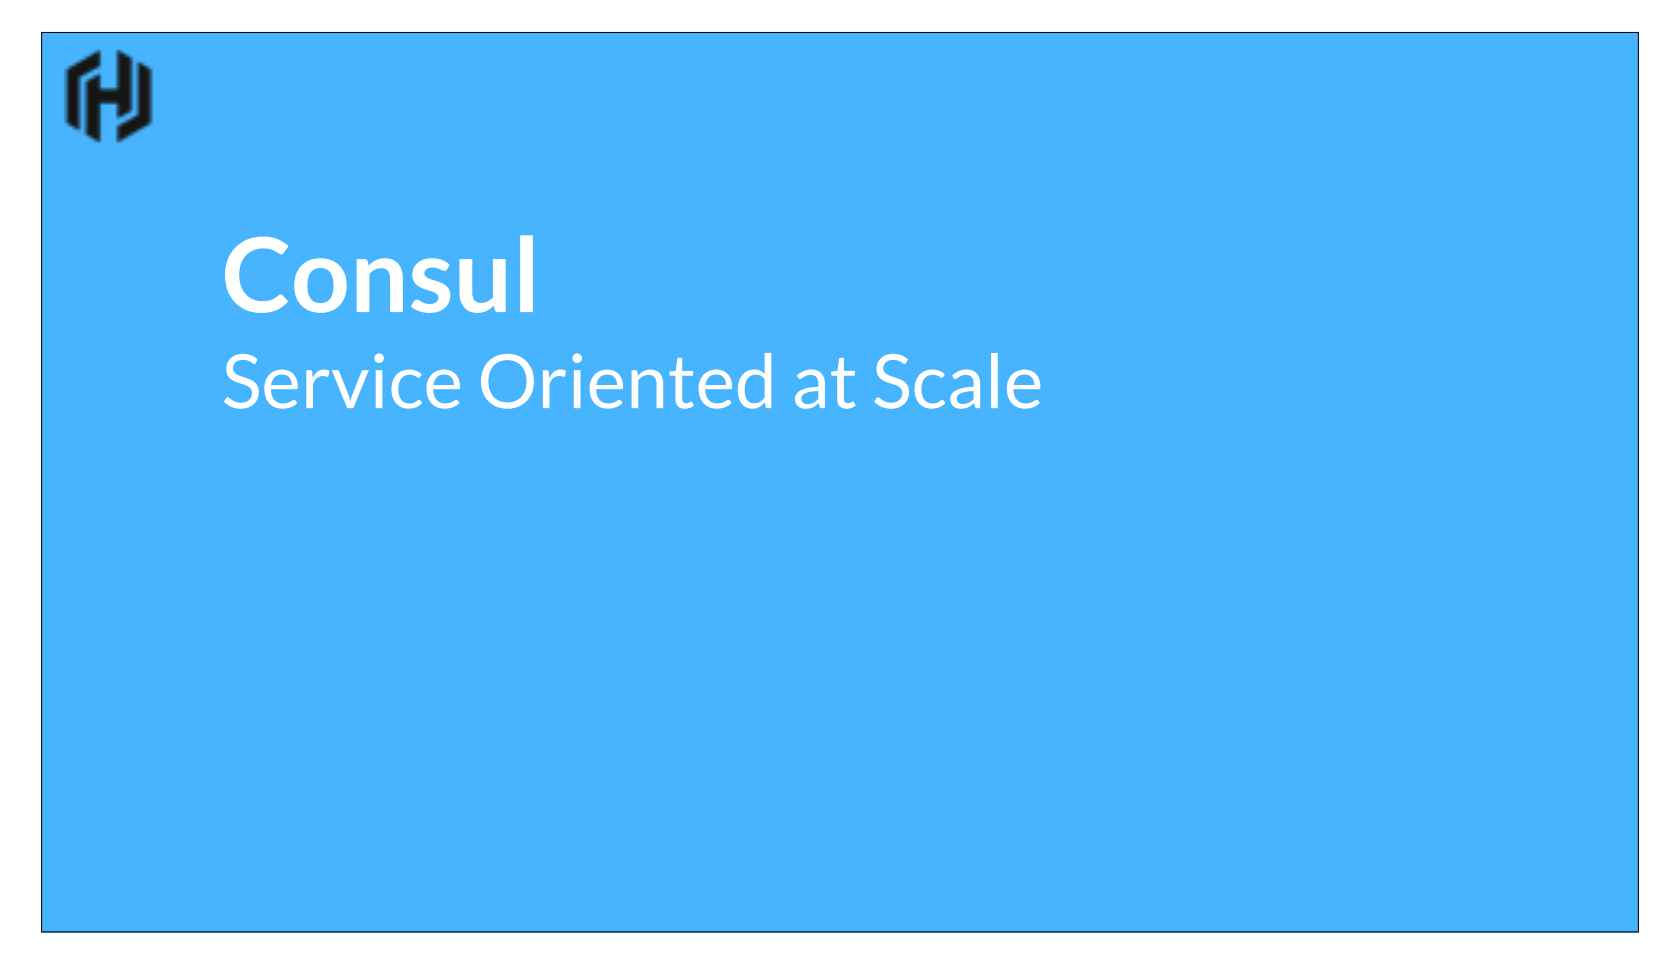 Consul: Service-oriented at Scale